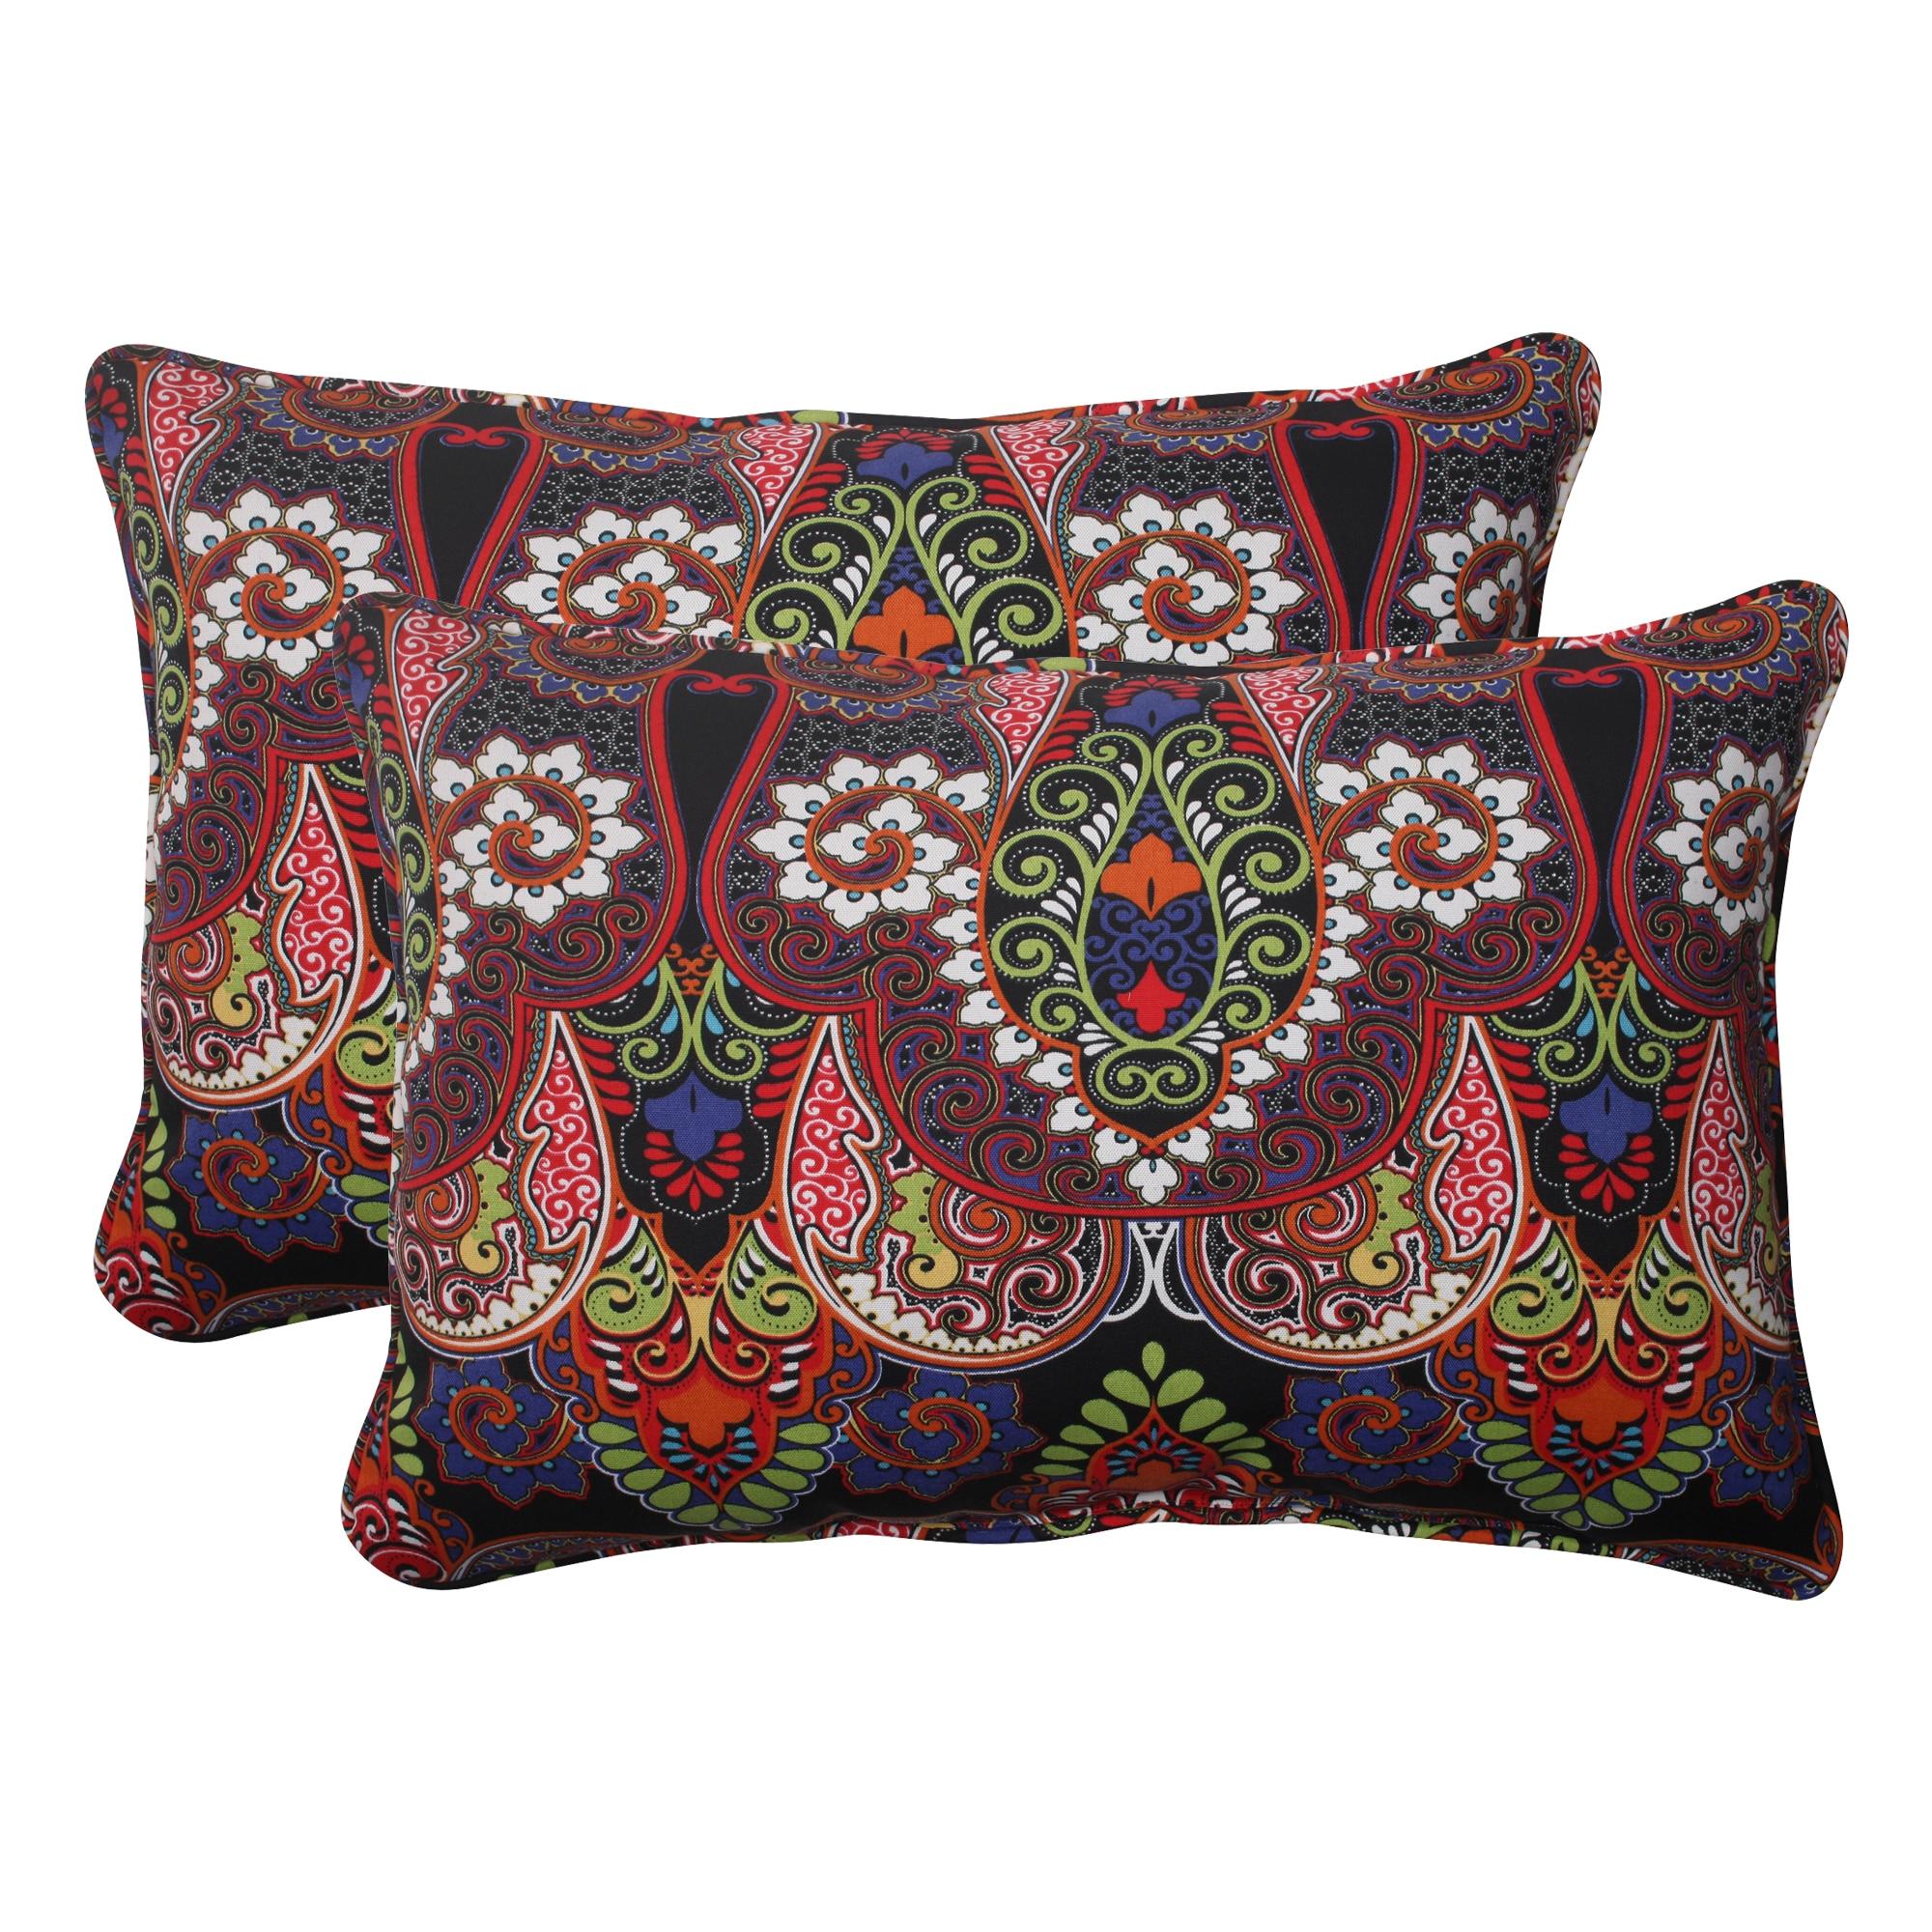 Pillow Perfect Black Outdoor Marapi Corded Oversized Rectangular Throw Pillow (Set of 2) (Black)